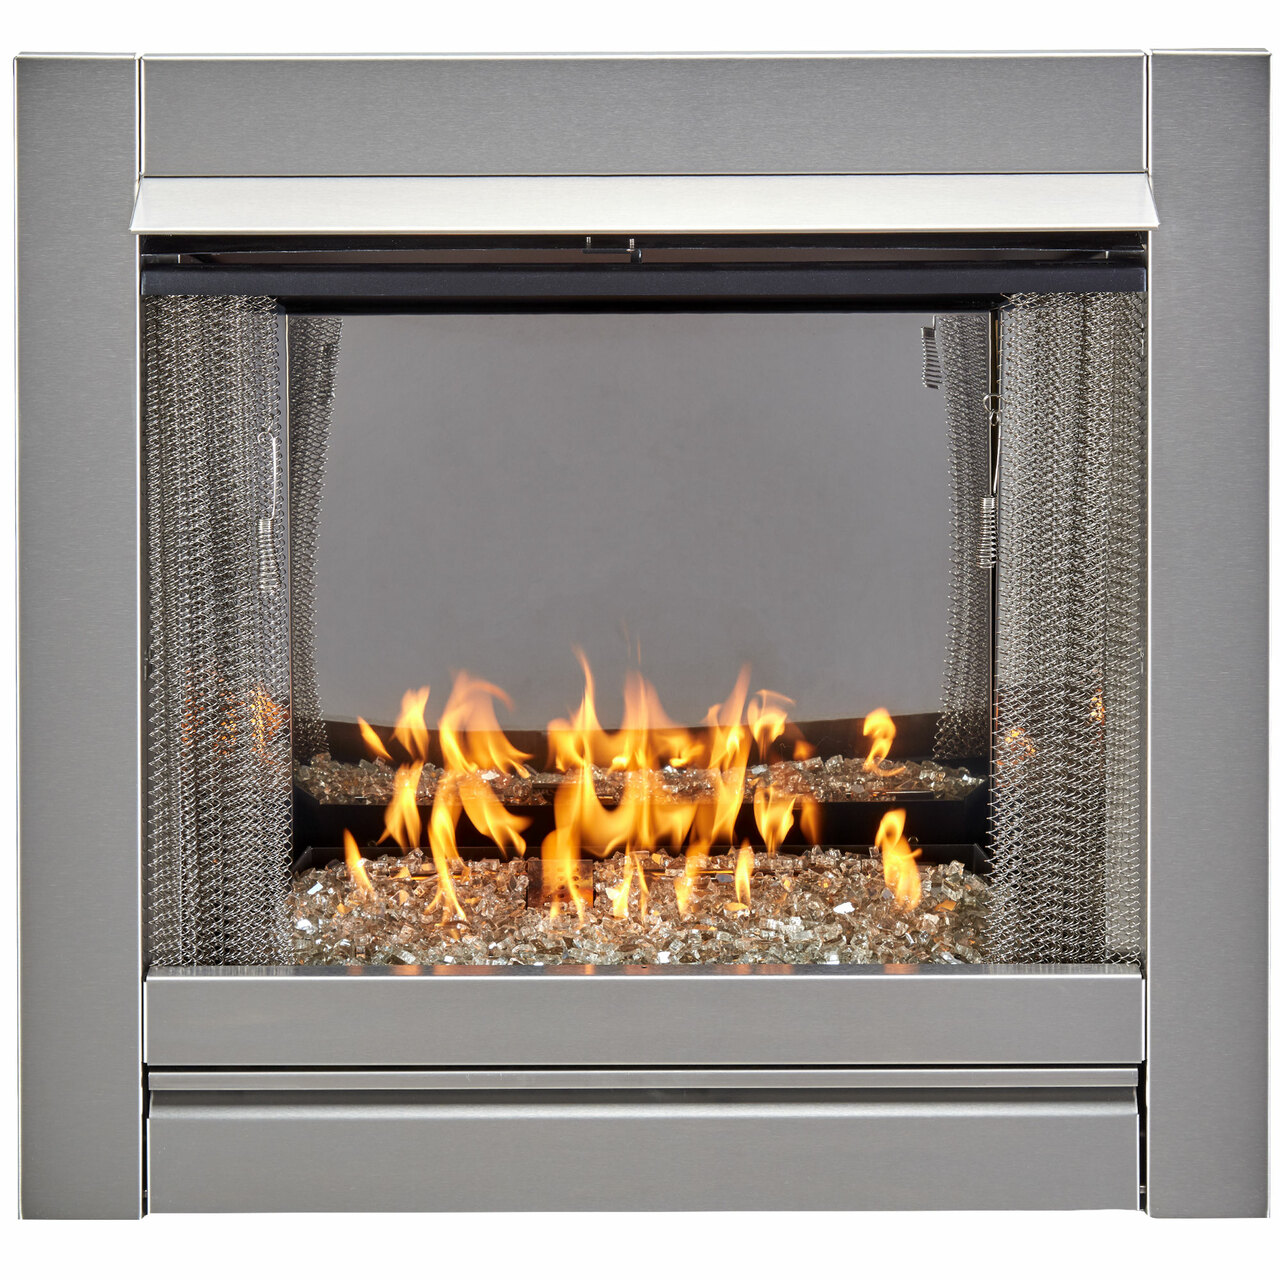 Bluegrass Living Vent Free Stainless Outdoor Gas Fireplace Insert